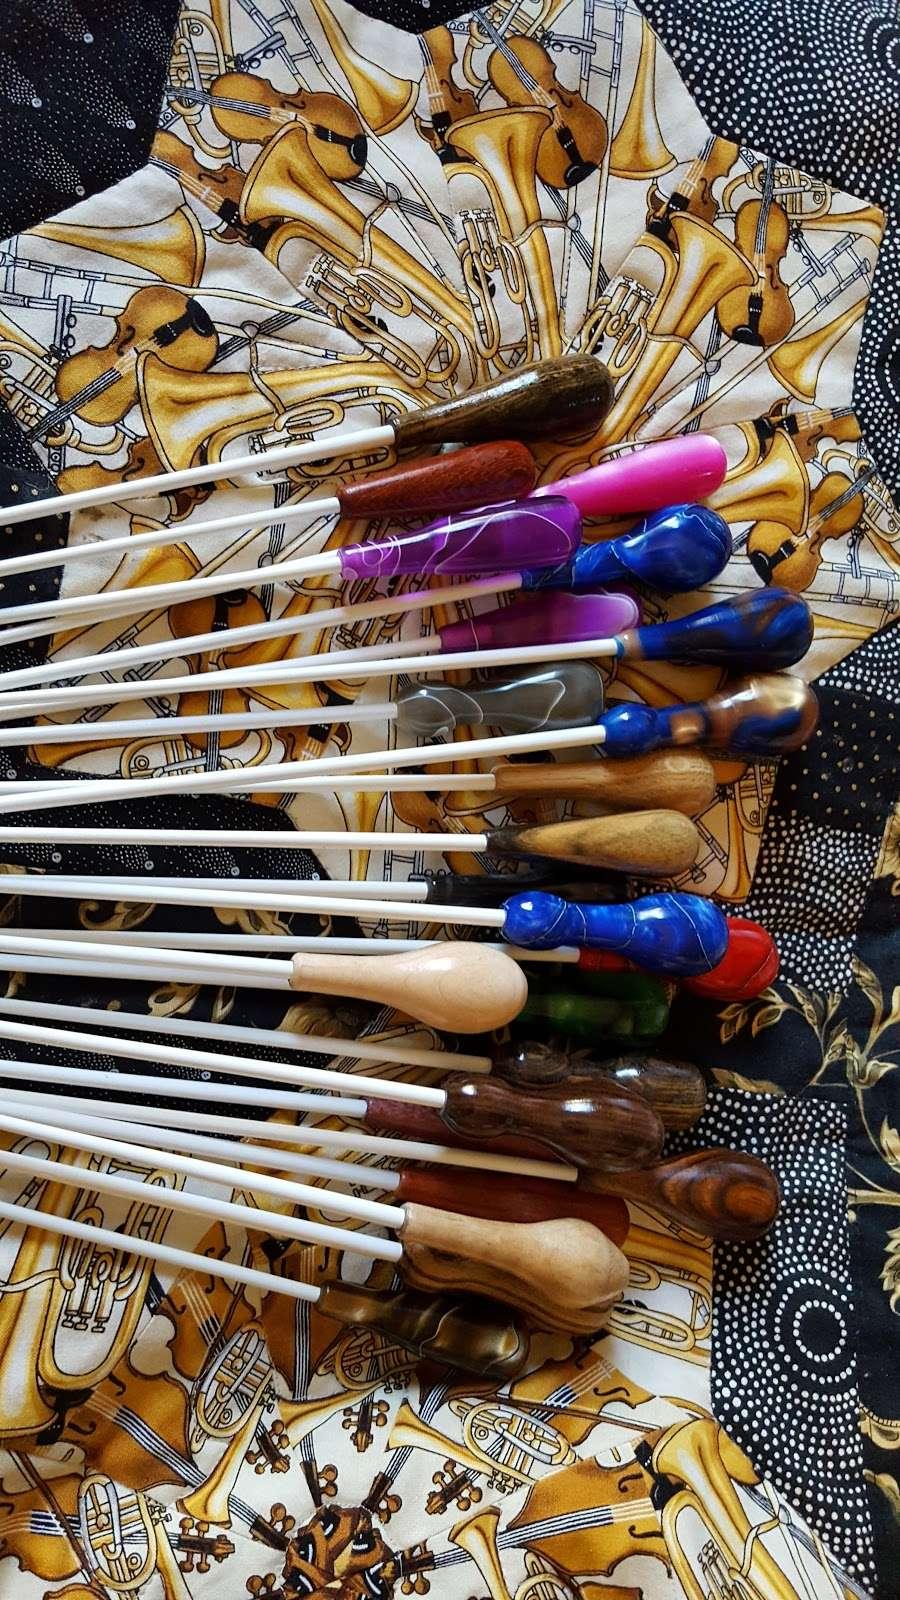 Music Works Custom Batons - electronics store    Photo 10 of 10   Address: P.O.Box 303, 311 Eureka St, Central City, CO 80427, USA   Phone: (303) 322-4560